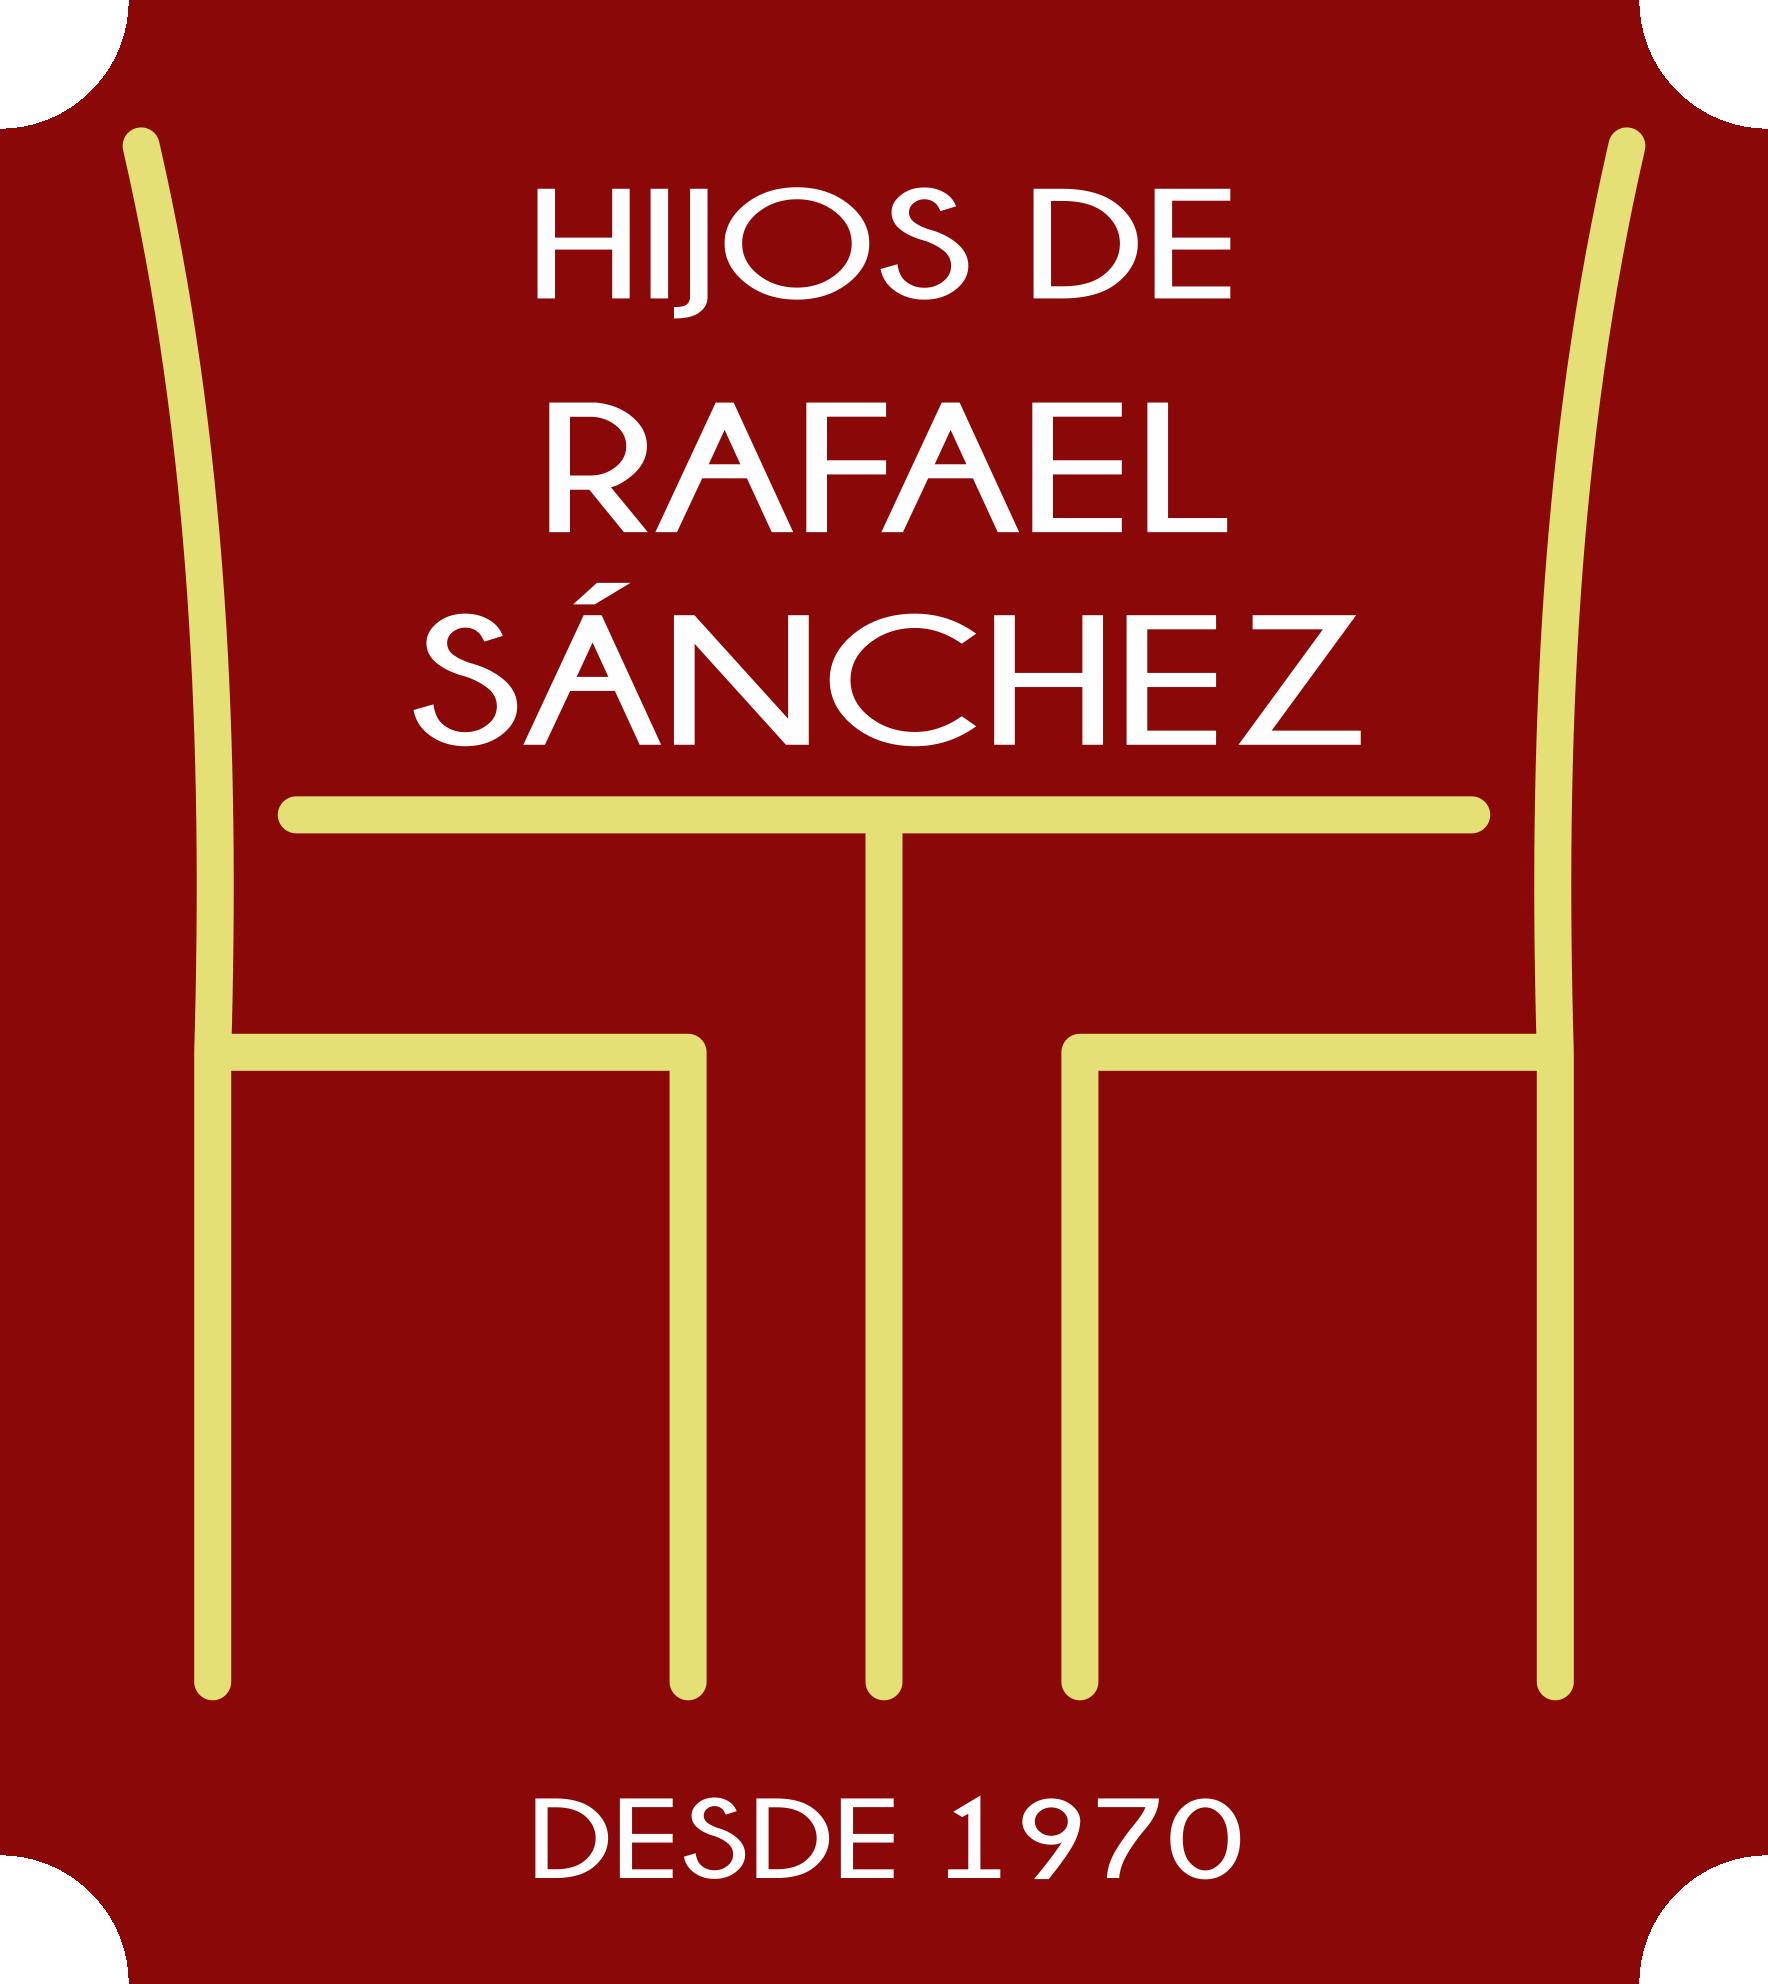 HRS Hijos de Rafael Sánchez